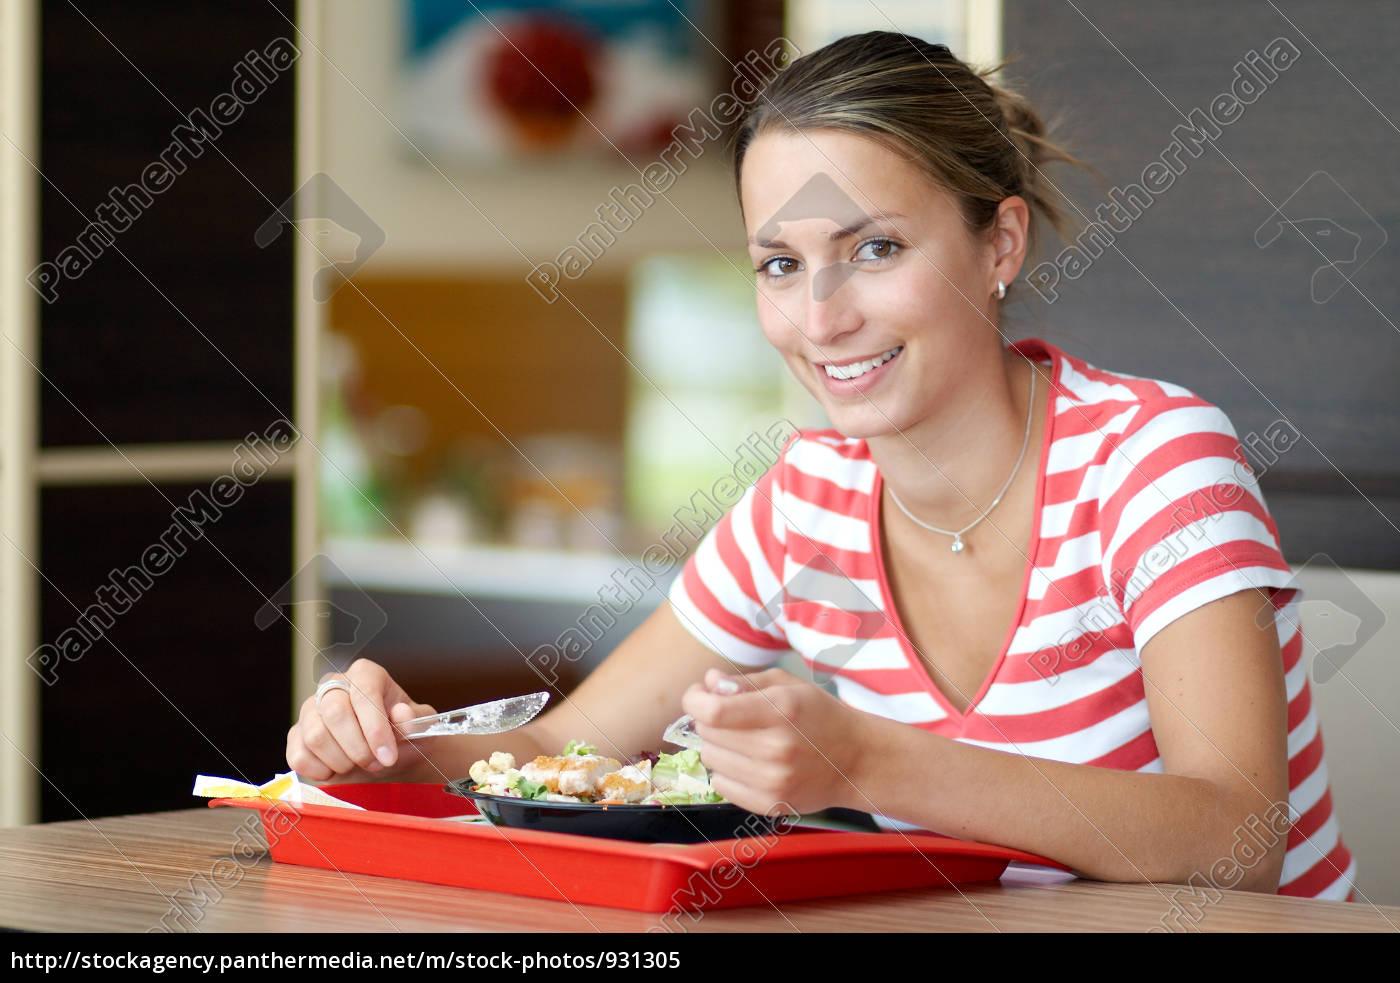 young, woman, eating, salad - 931305